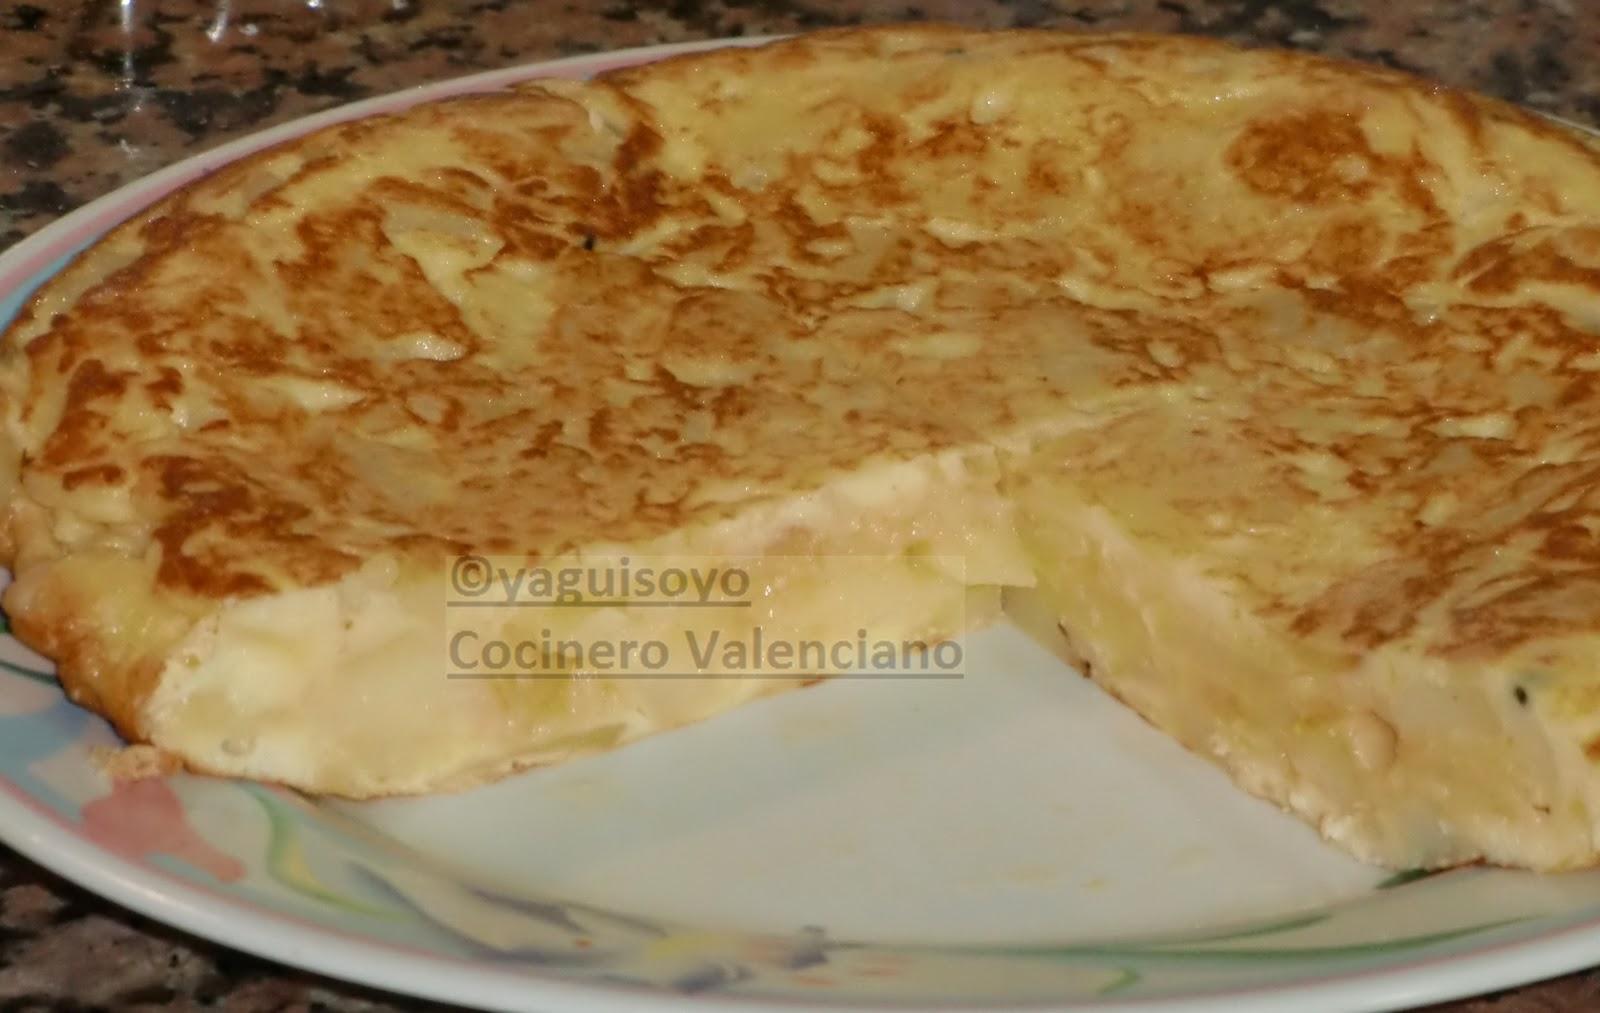 Ya guiso yo: Pinchos de Tortilla de Patata rellena